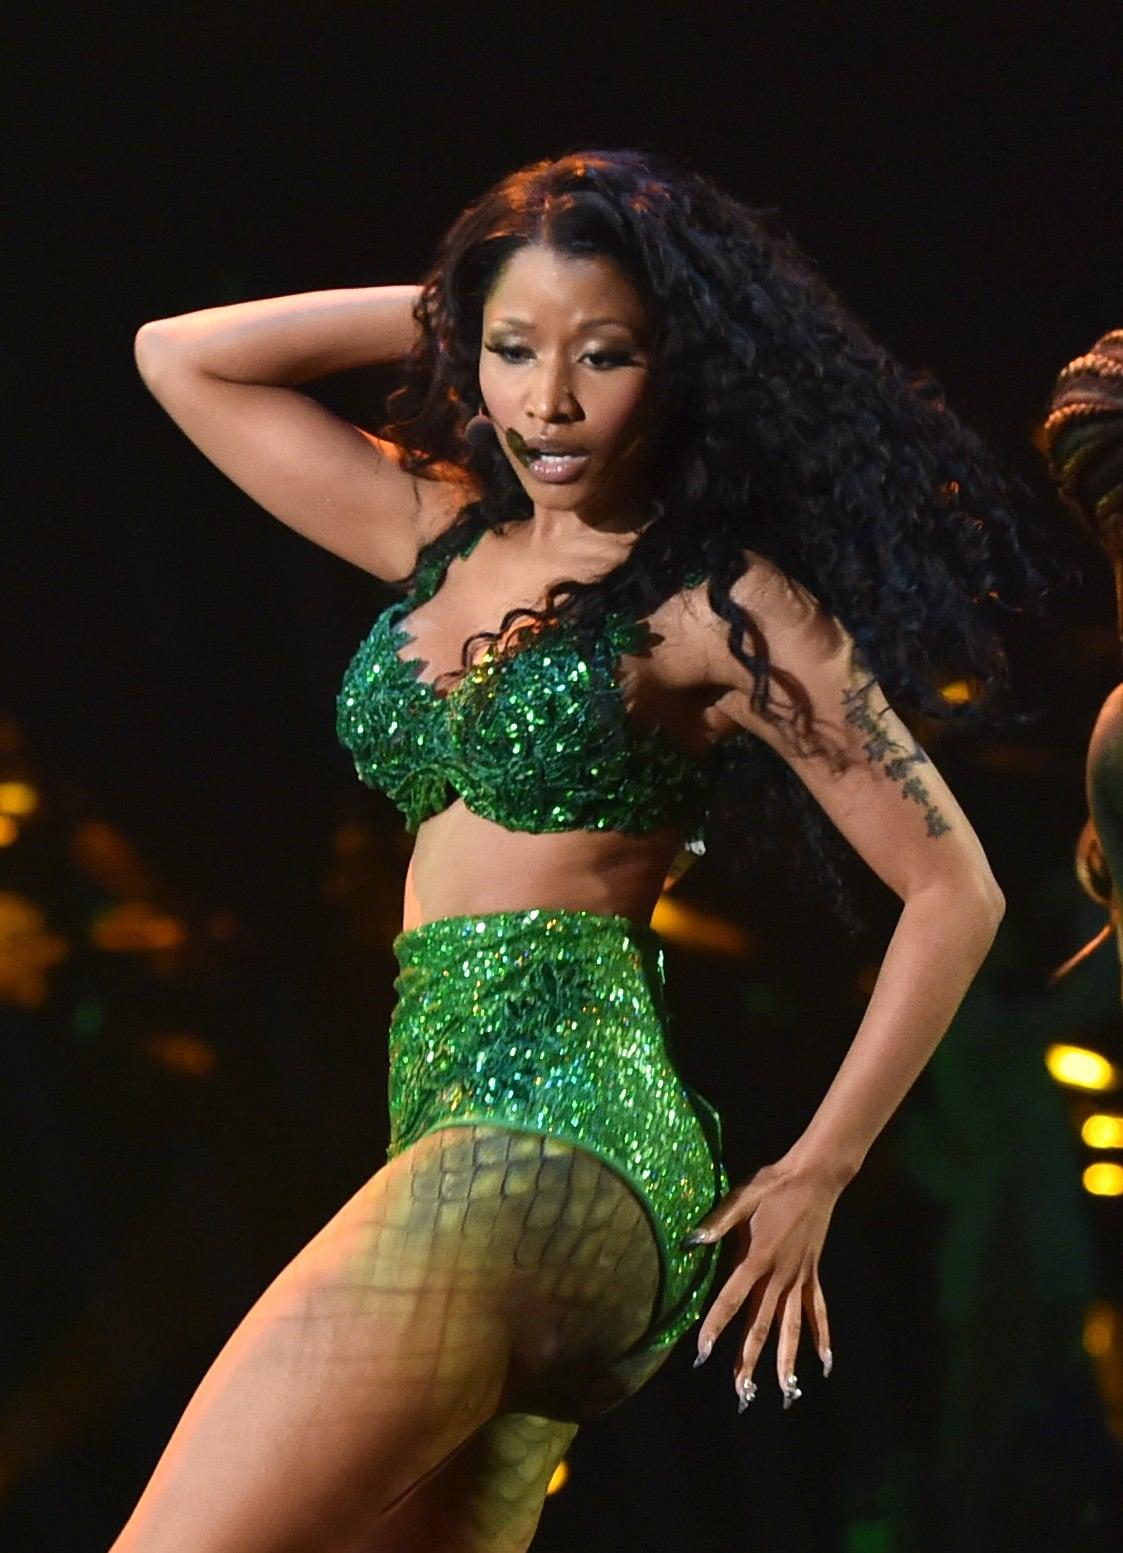 Nicki Minaj Nearly Missed a Wardrobe Malfunction During Her Raunchy VMAs Performance